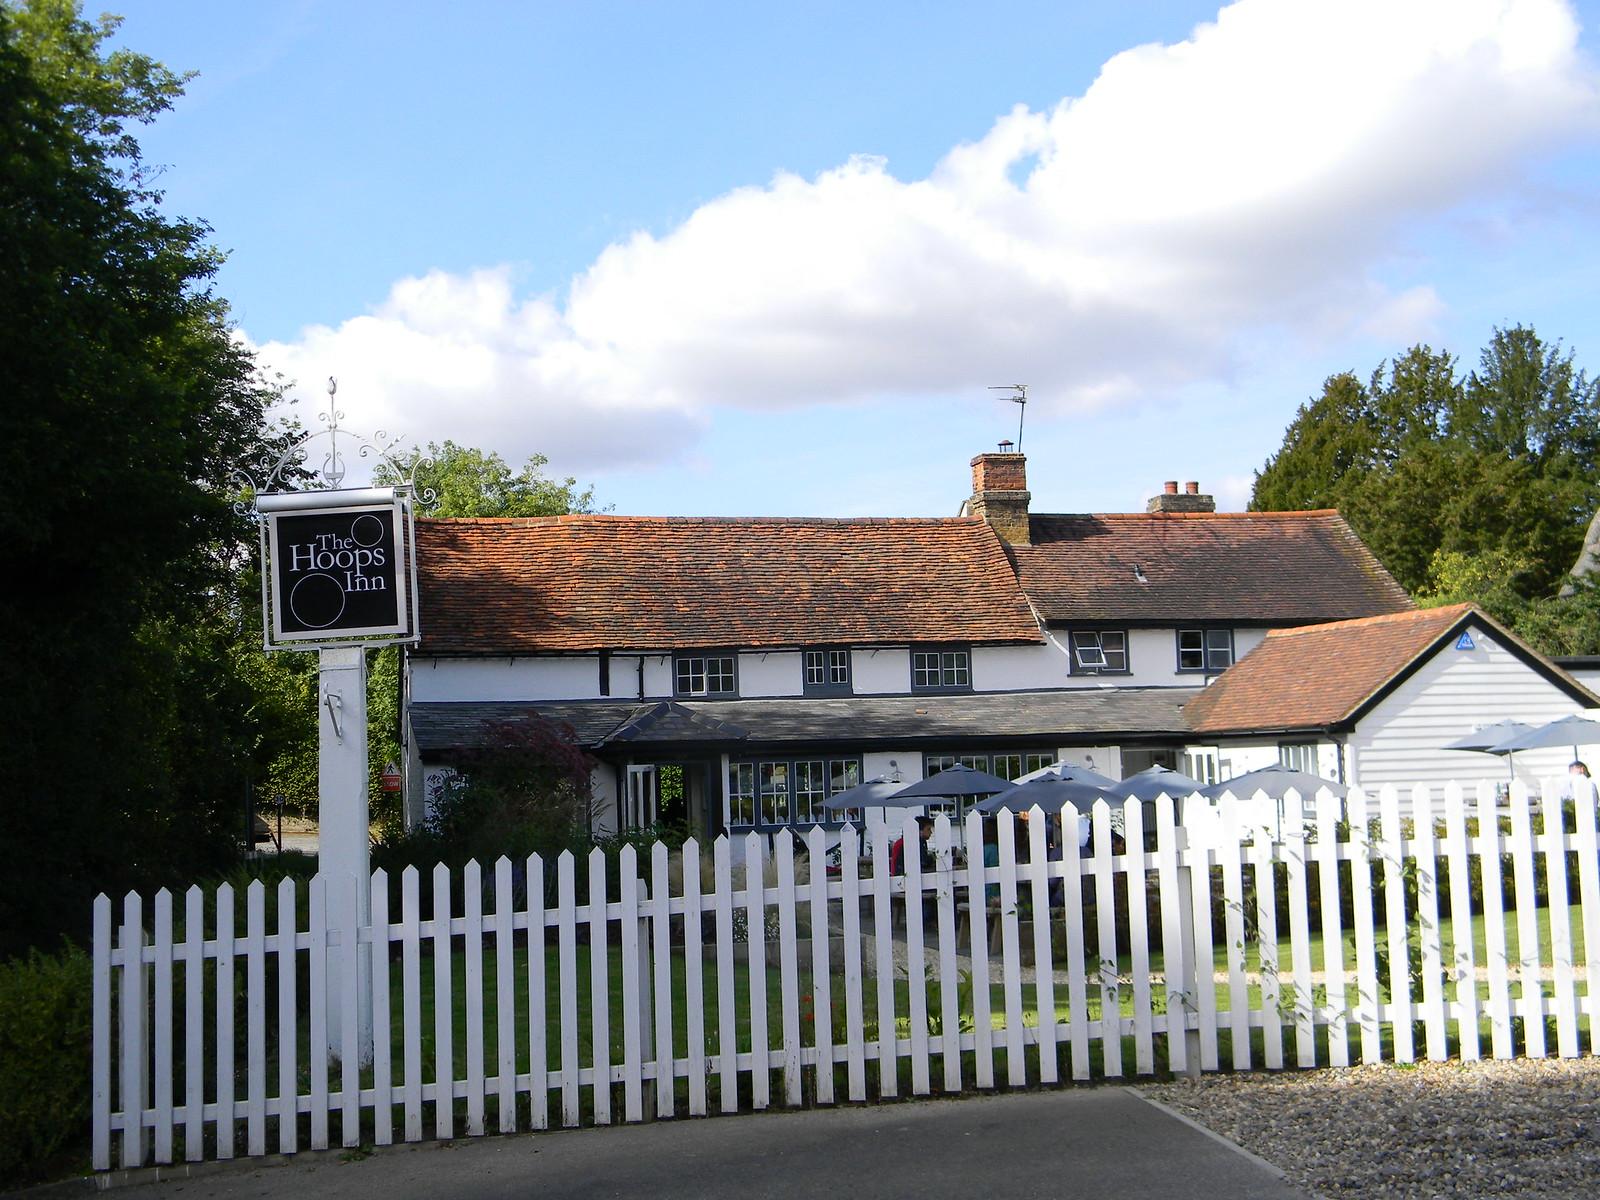 The Hoops Perry Green Roydon to Sawbridgeworth